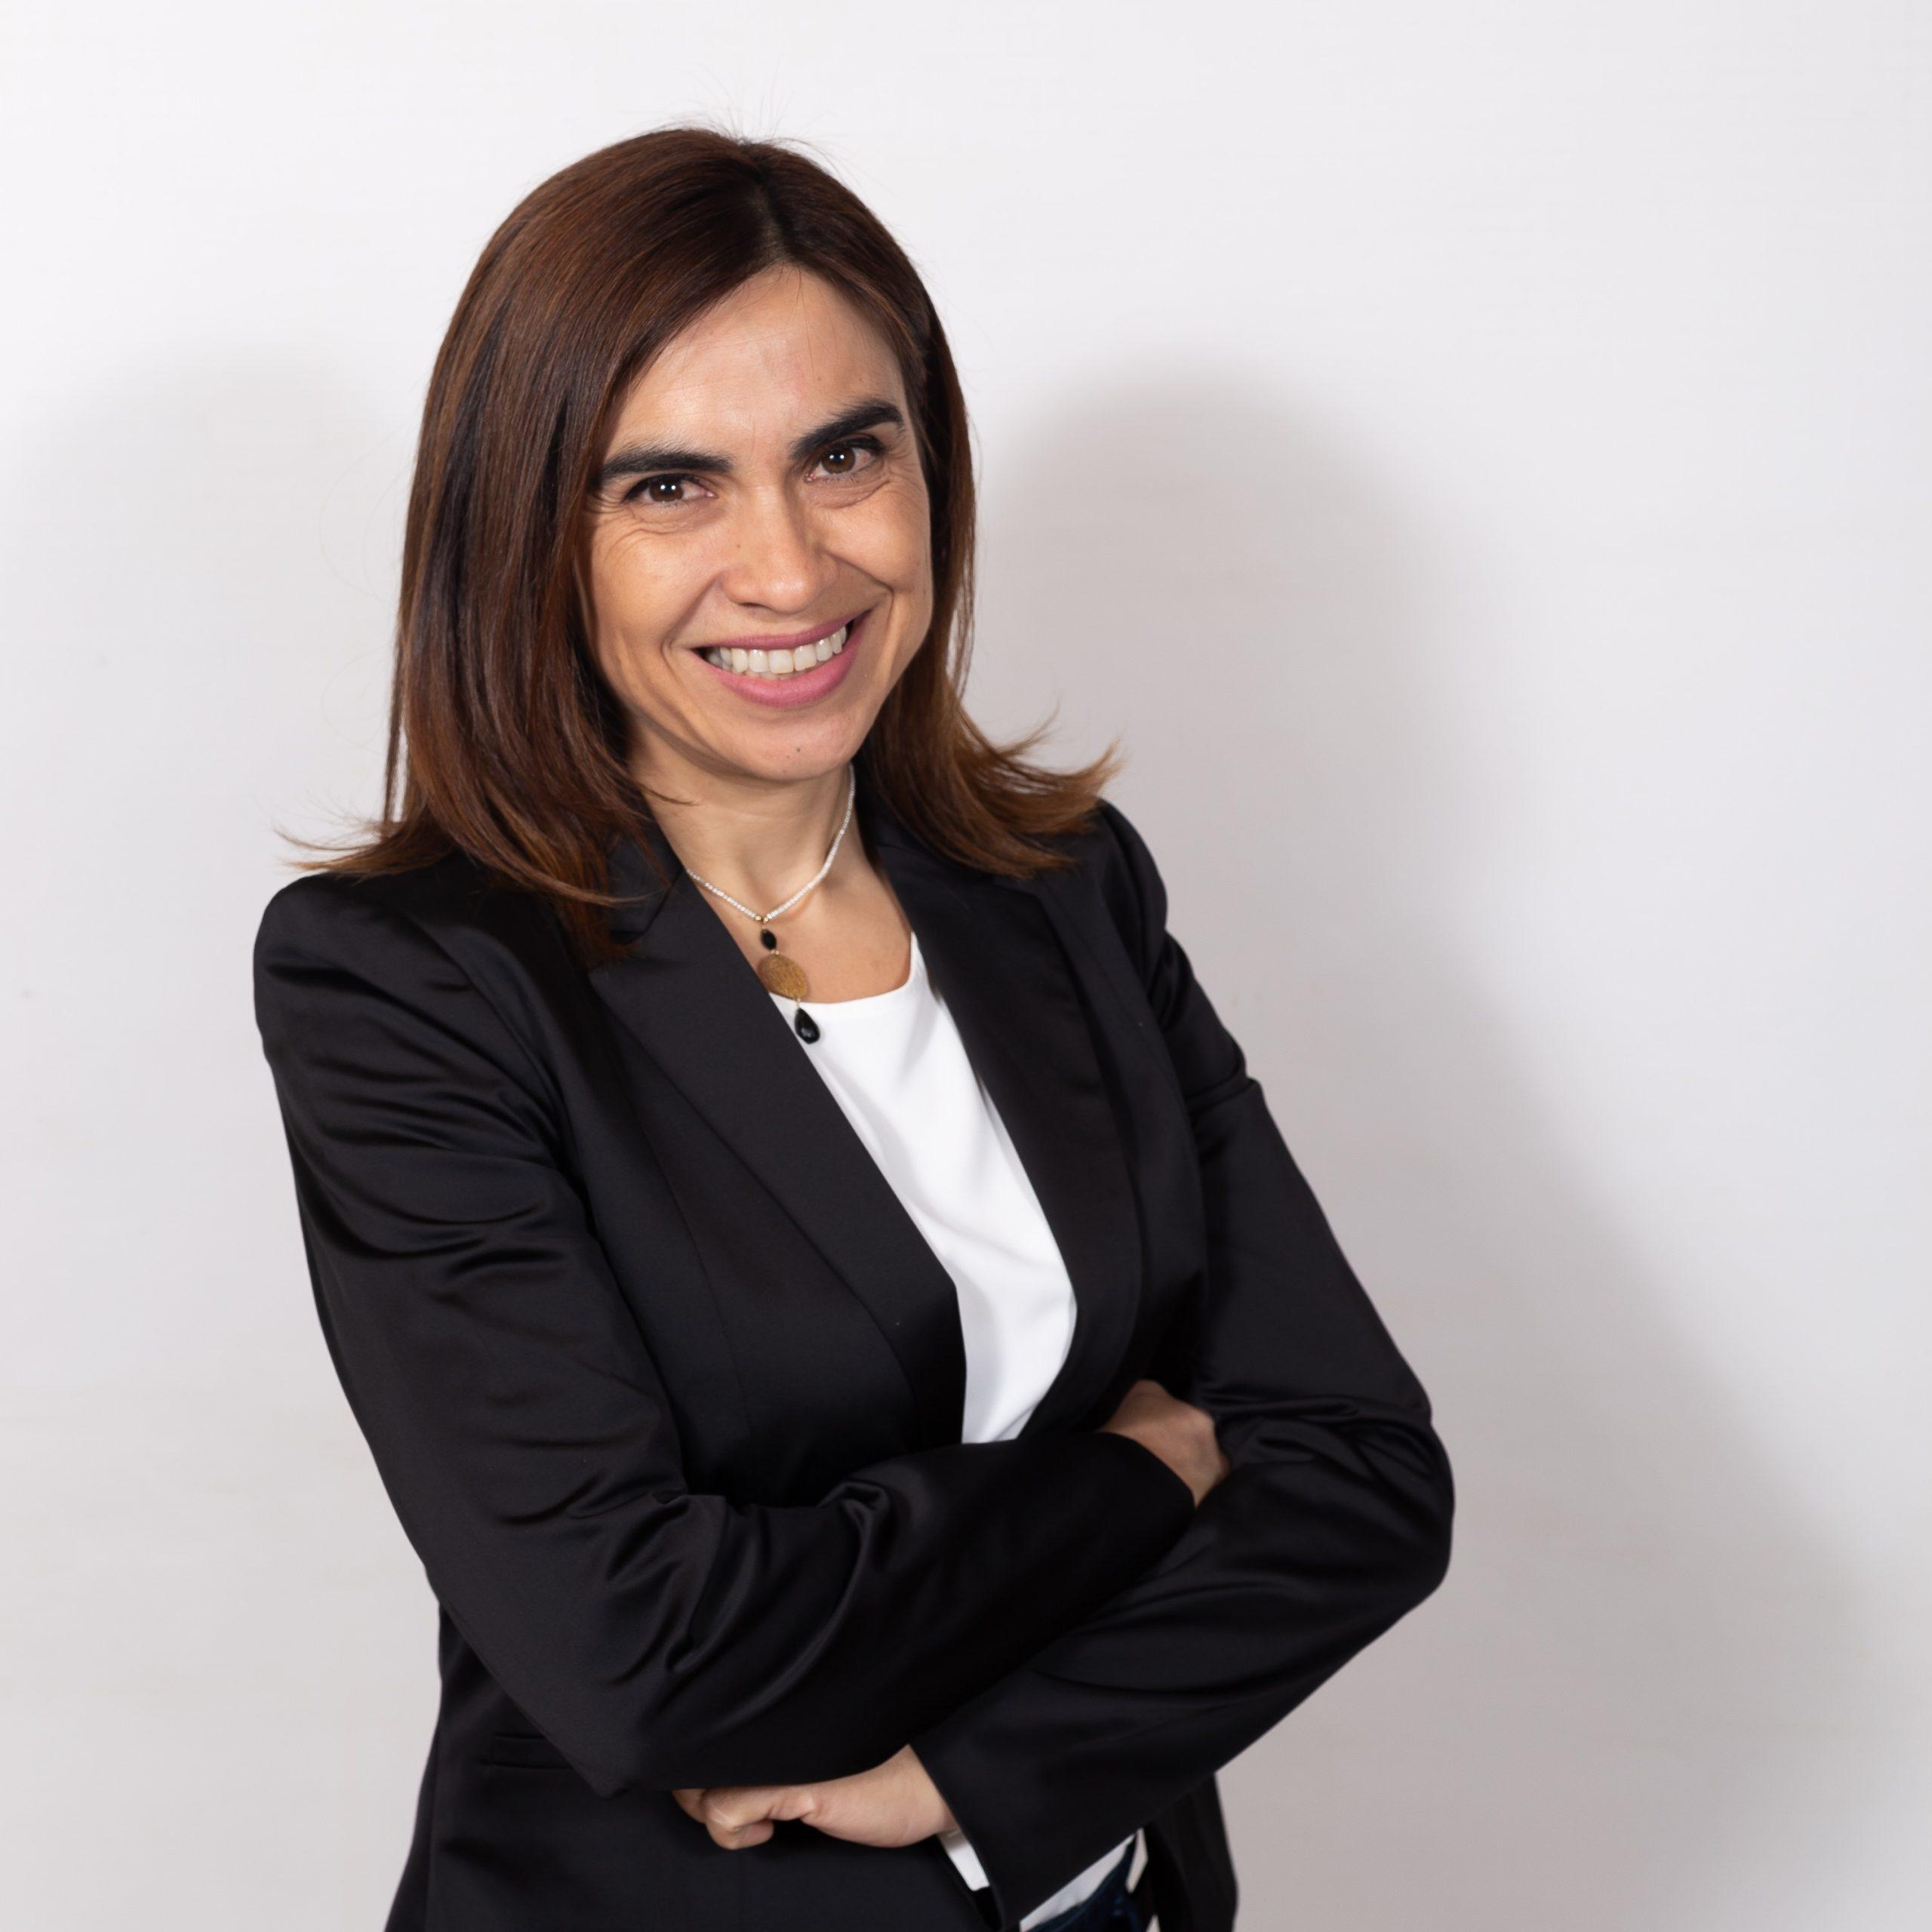 Paola Leyton Foto LinkedIn